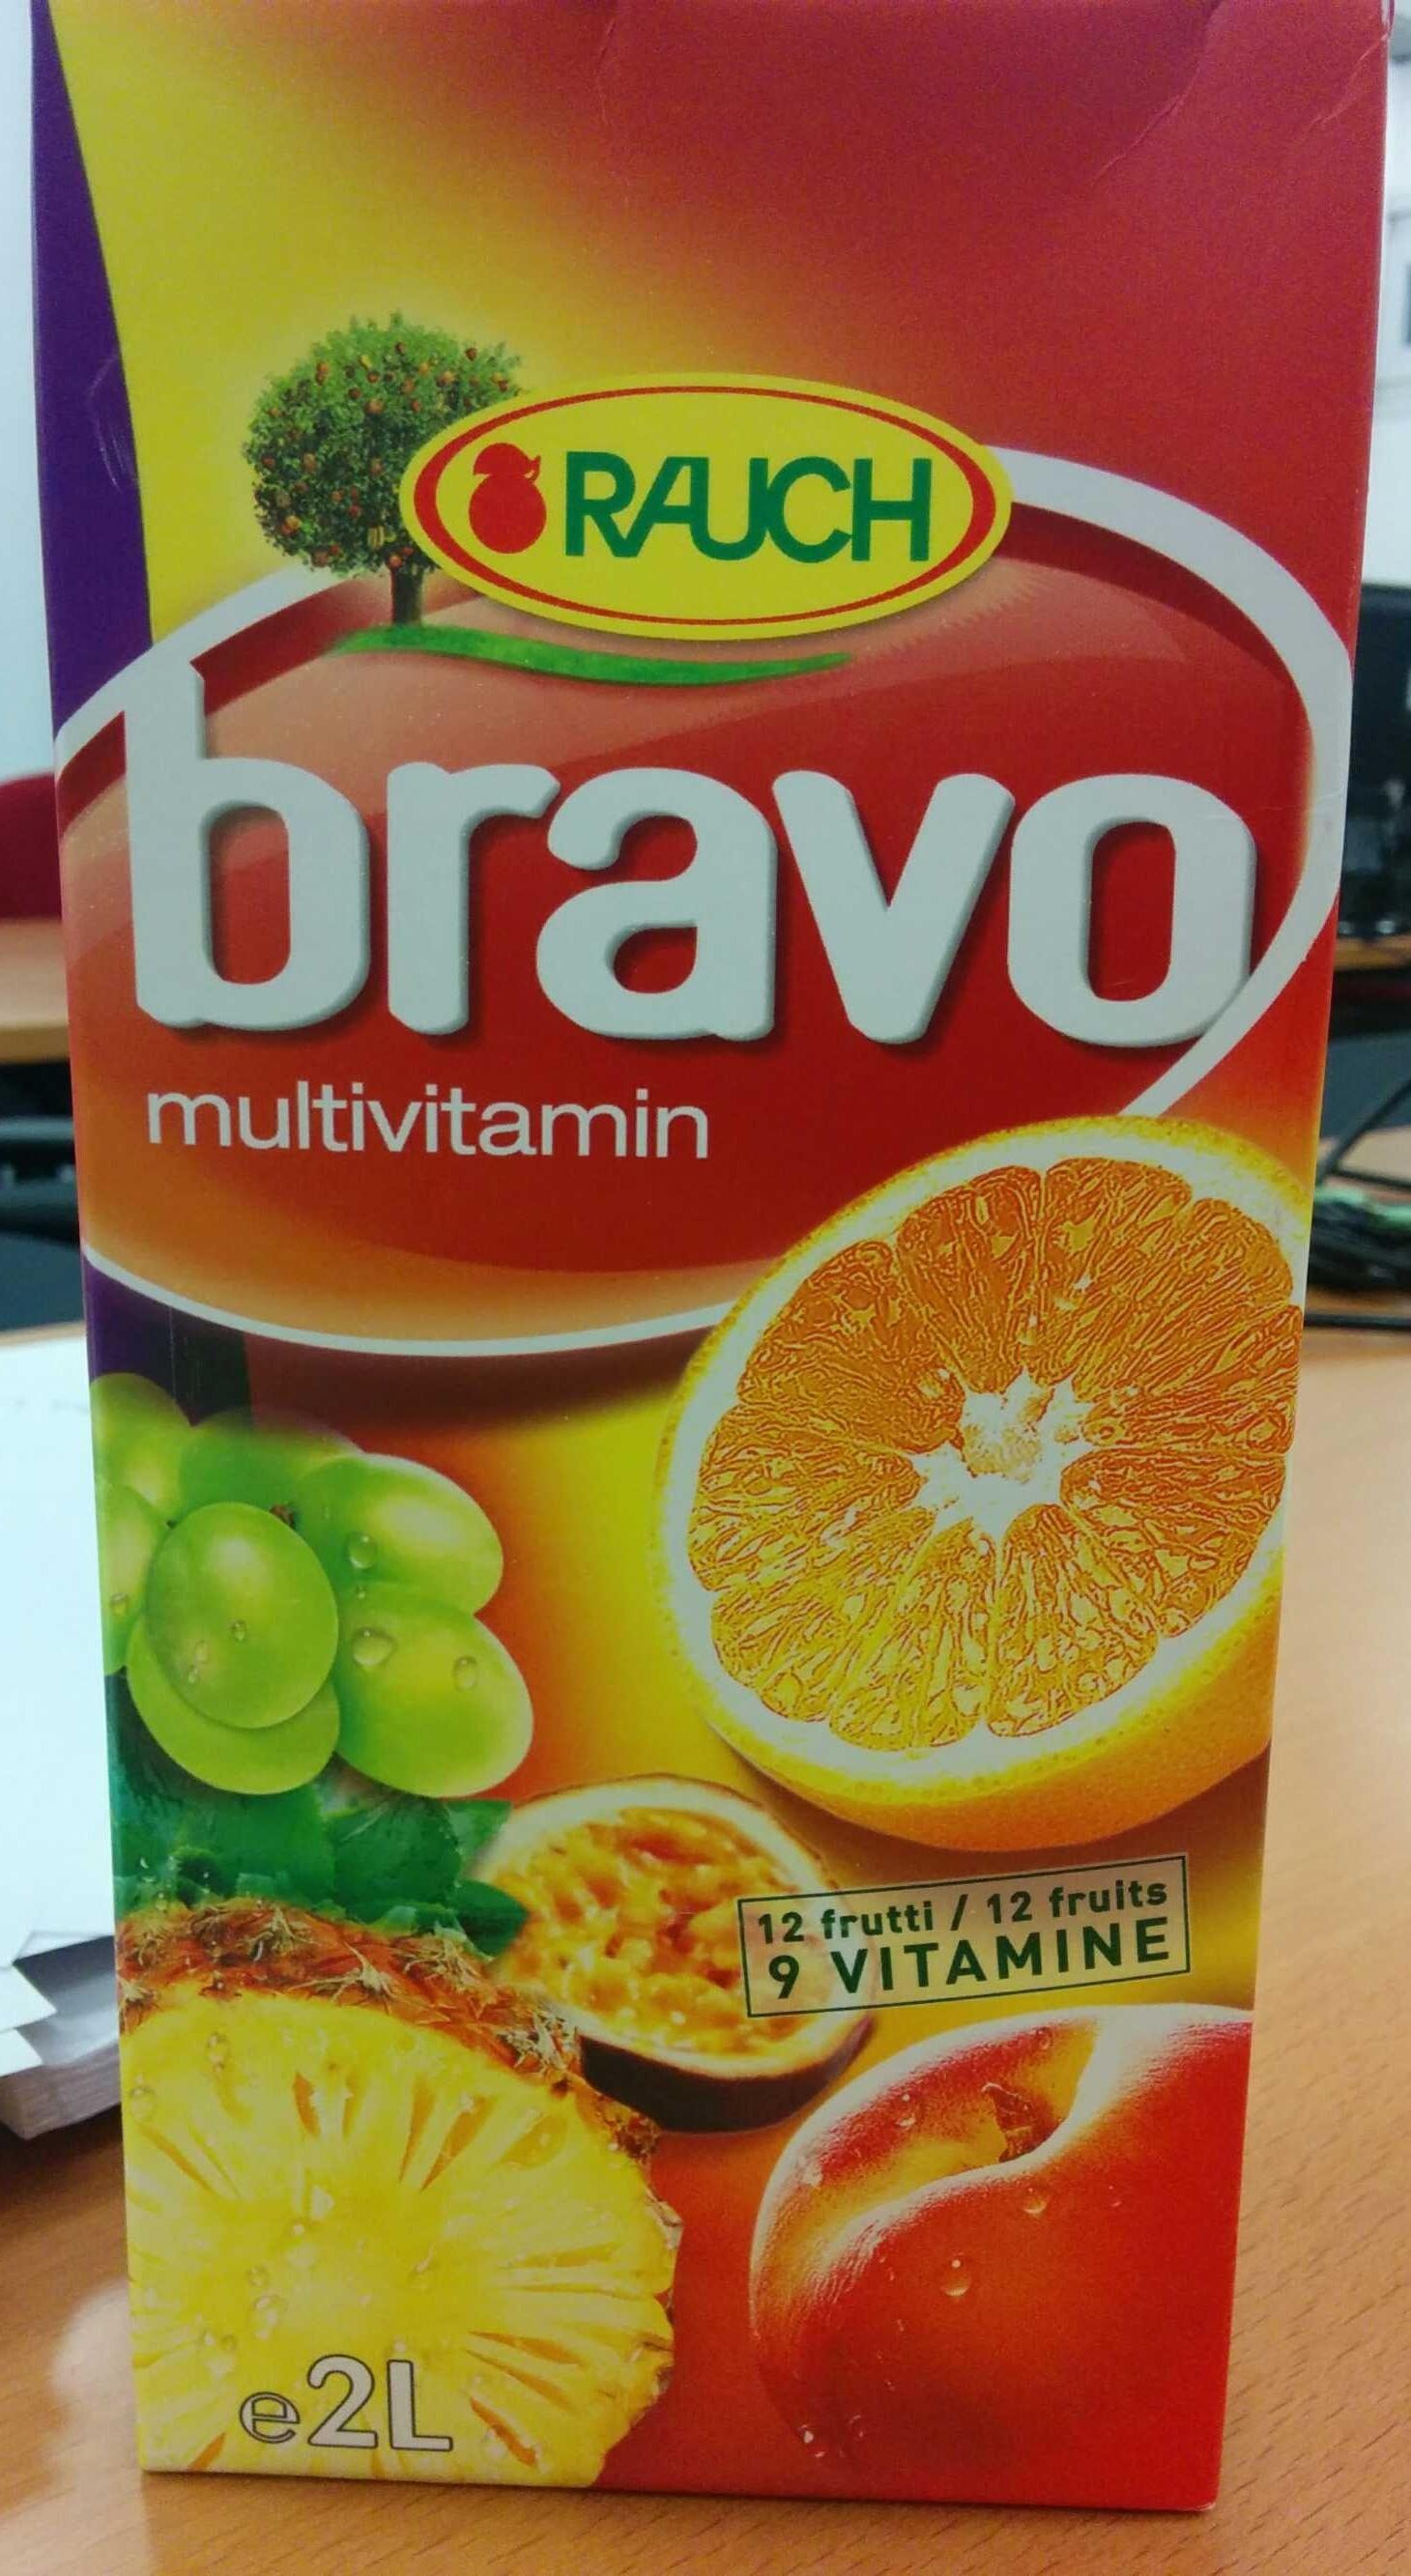 Bravo multivitamin - Product